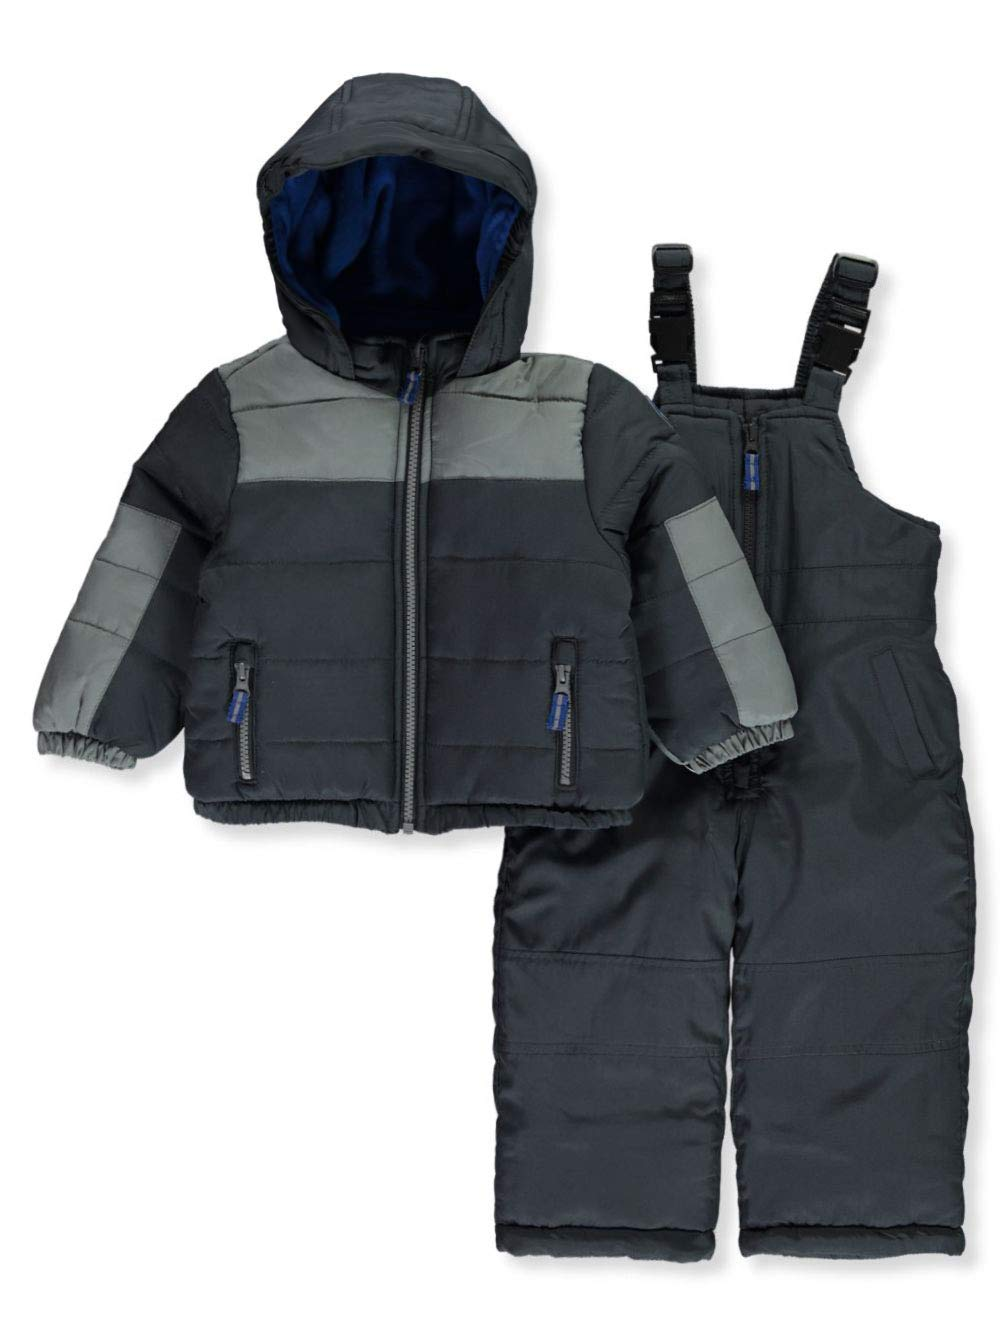 Osh Kosh Baby Boys Ski Jacket and Snowbib Snowsuit Set, Wharf Grey/Bumpercar, 12Mo by OshKosh B'Gosh